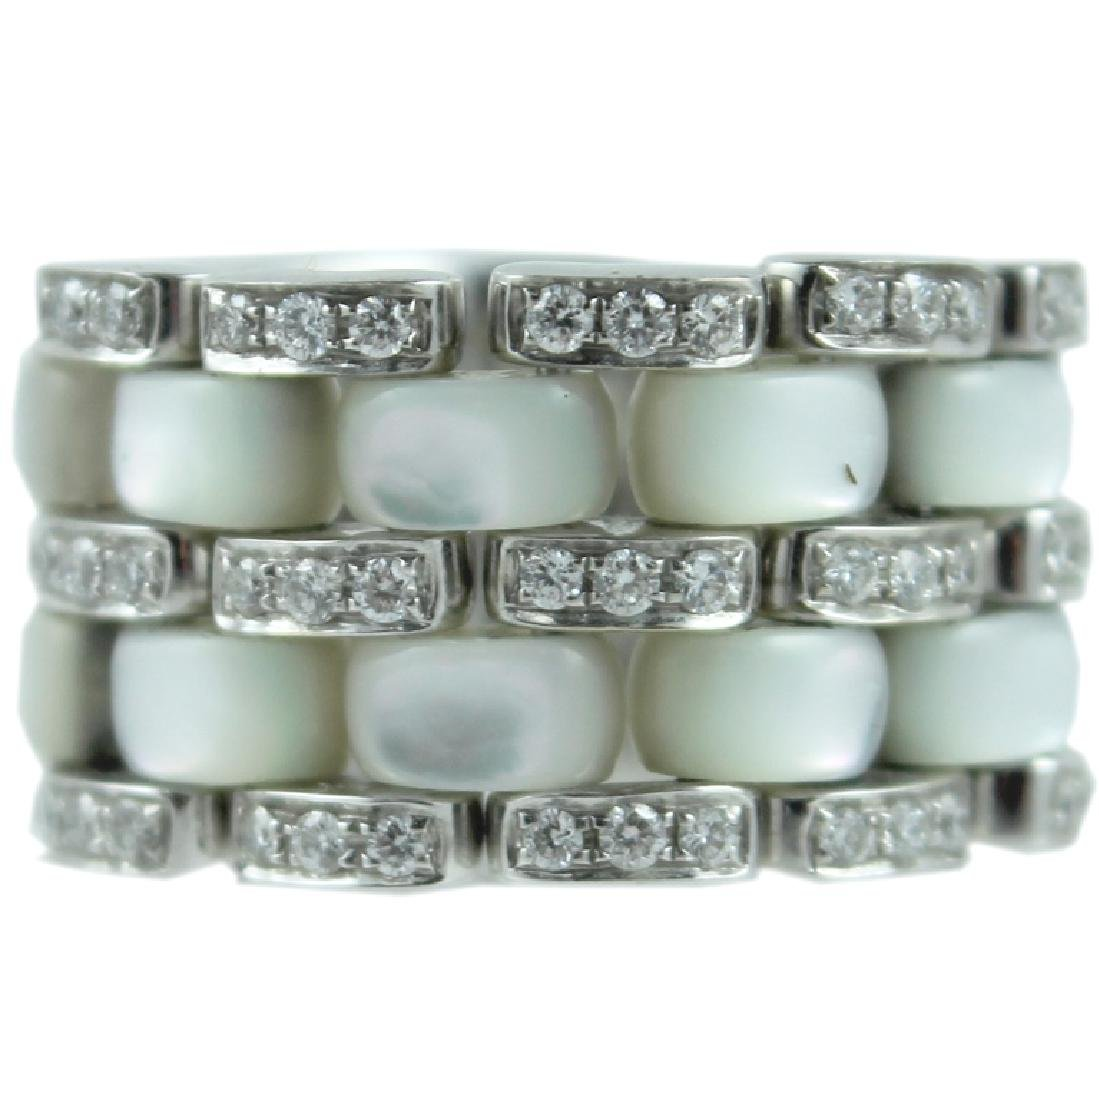 18K 'WG' Flexible M.O.P. & Diamond Ring